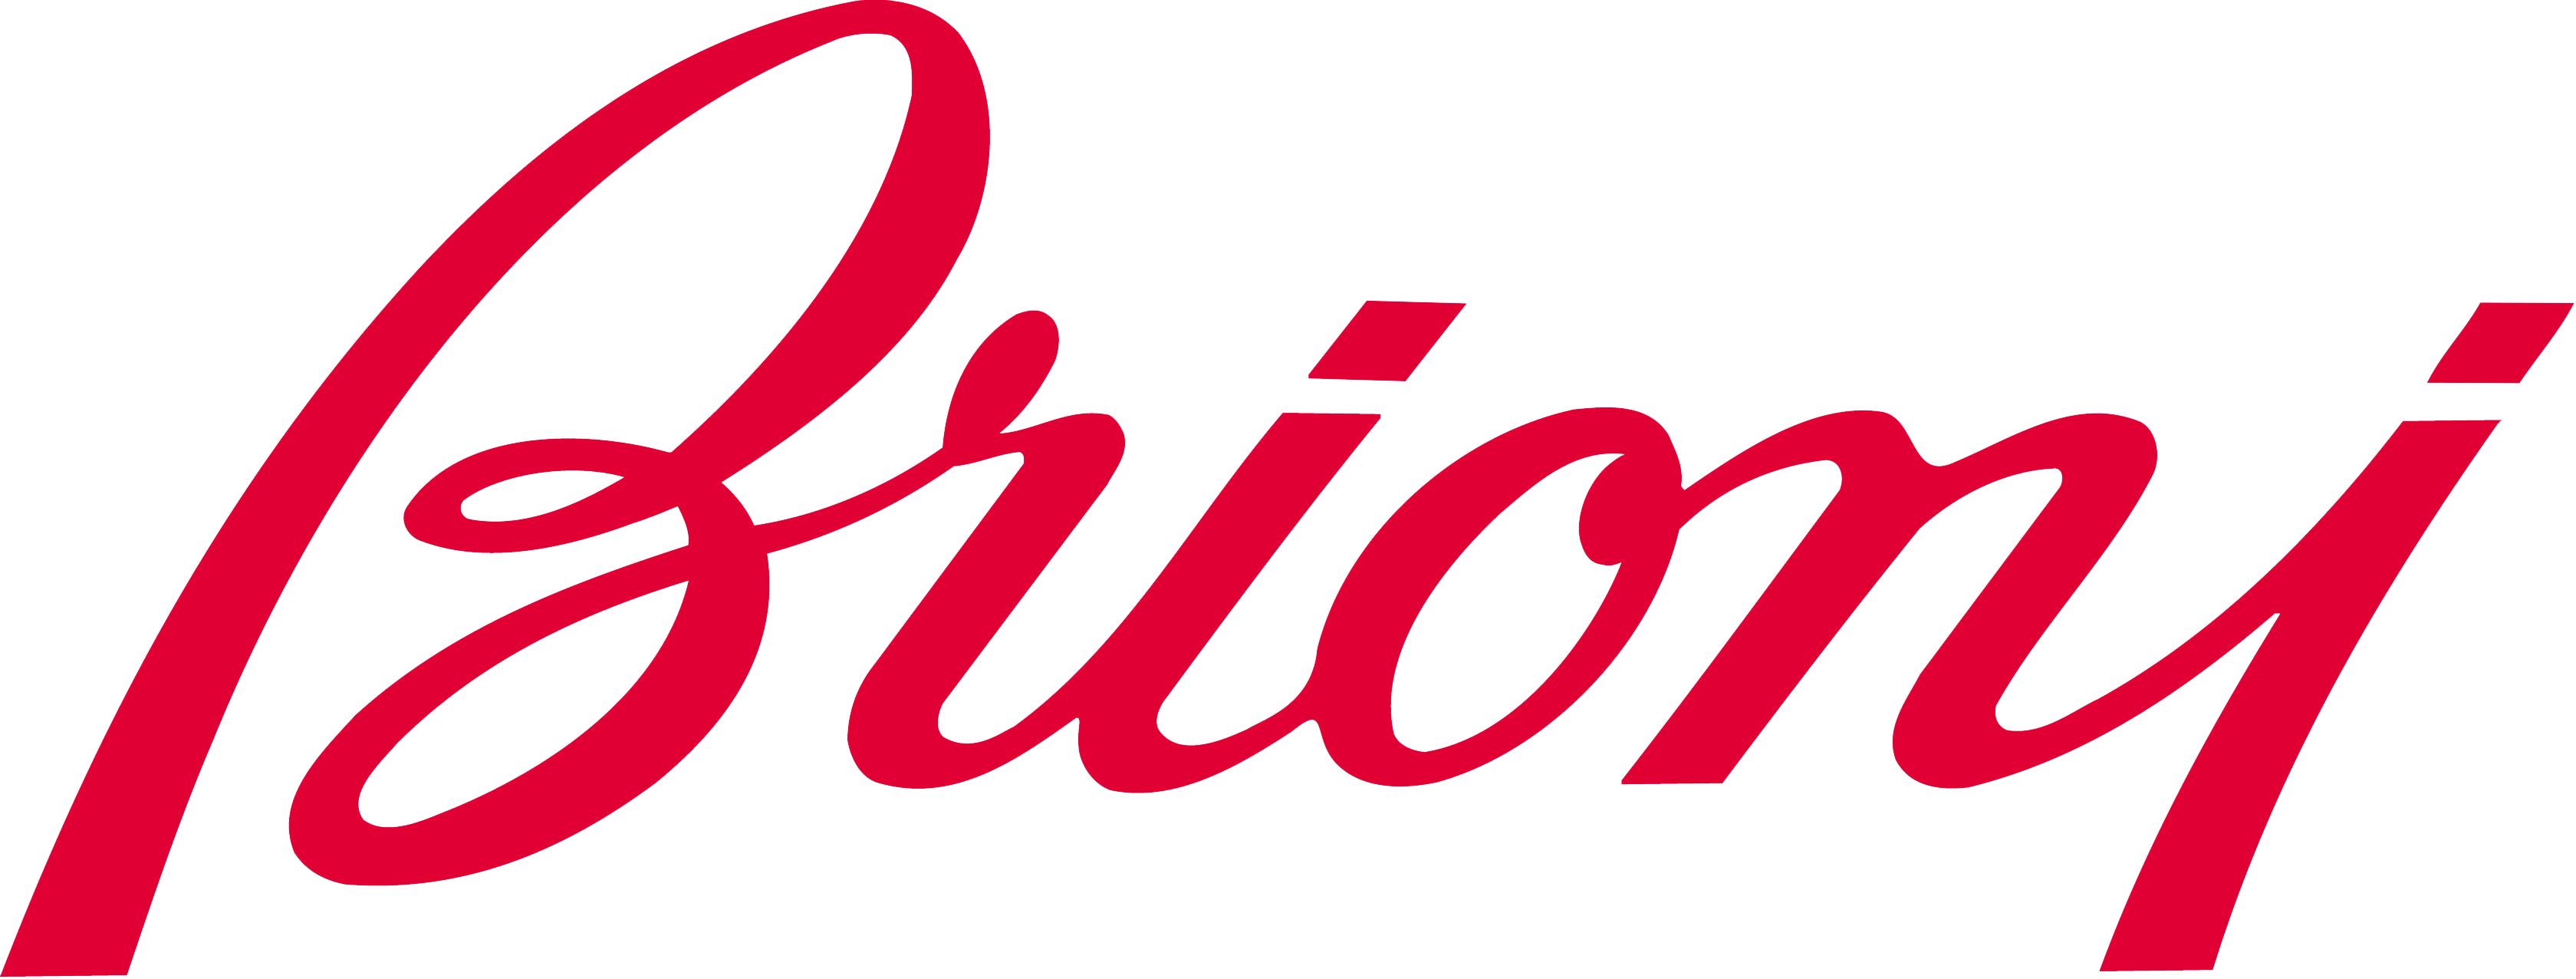 логотип бренда Brioni